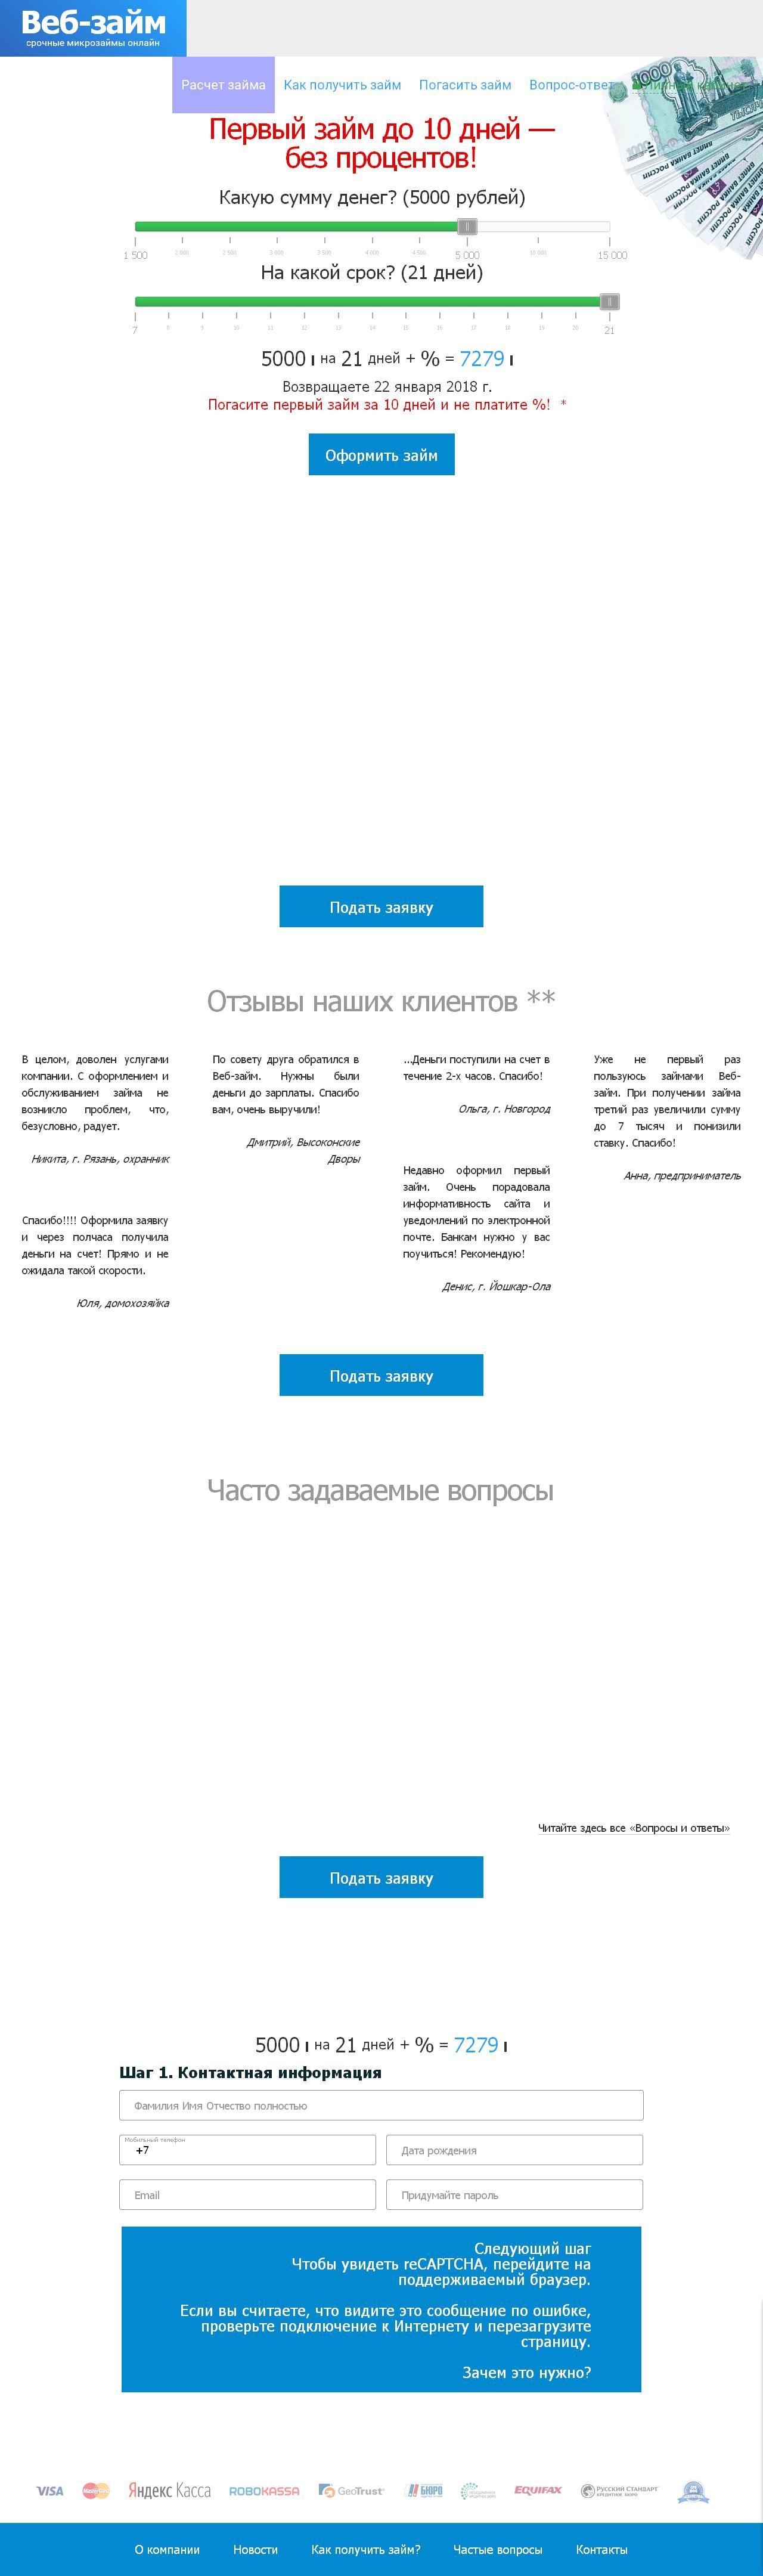 веб займ сайт